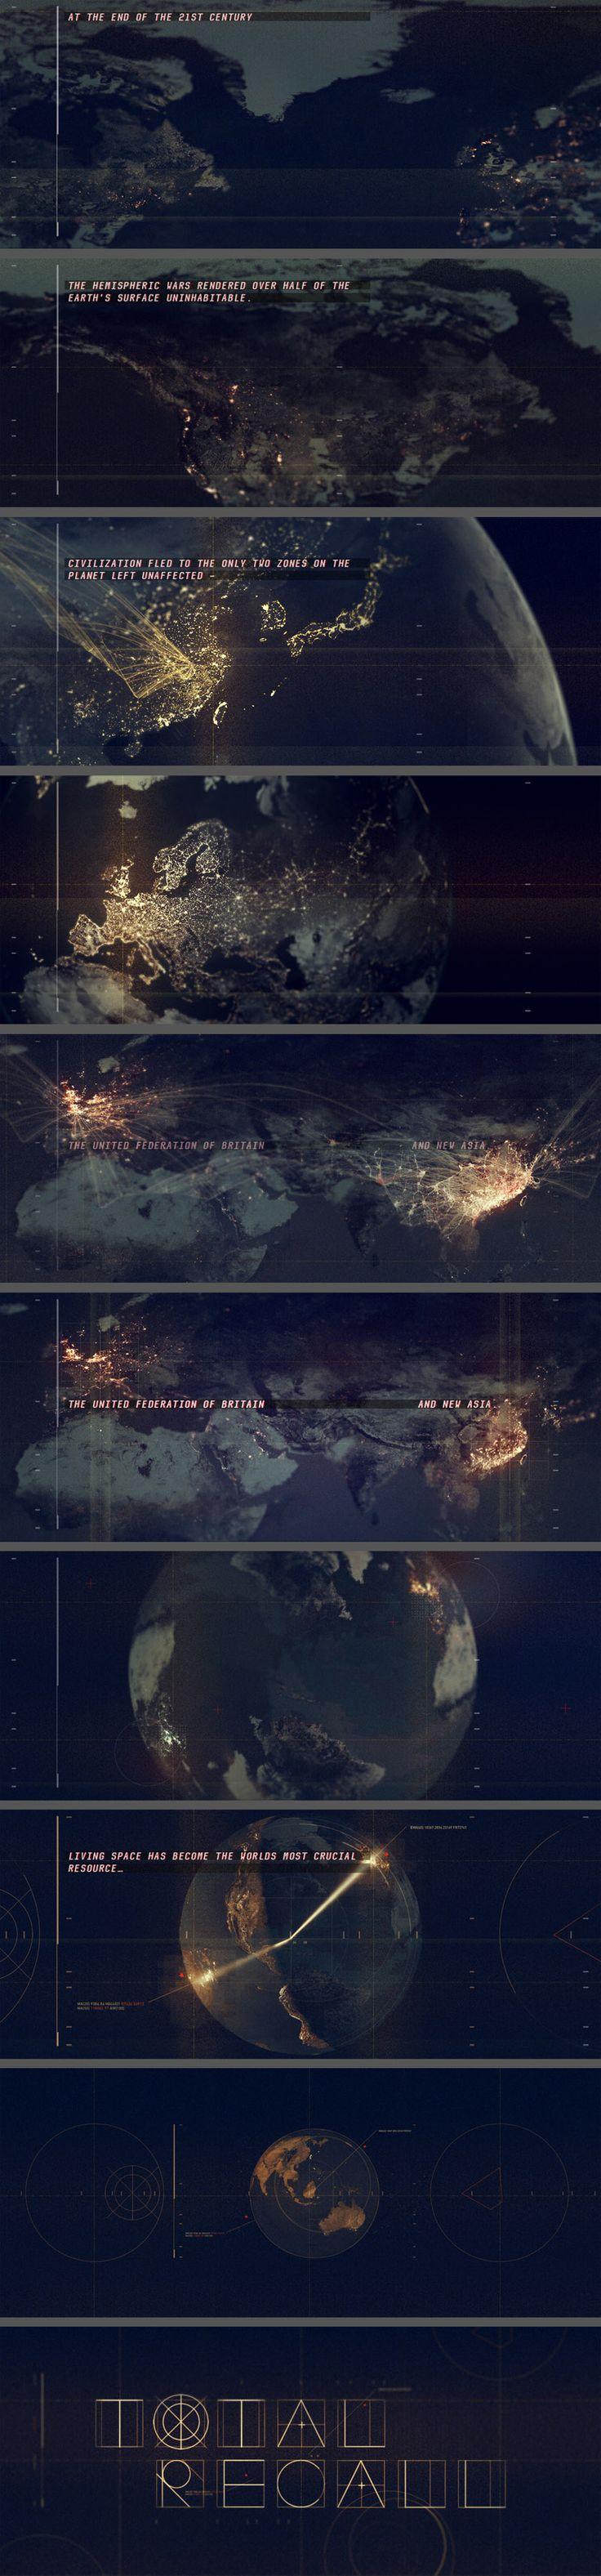 Total Recall Prologue Title Sequence Ji Yun Ha Design